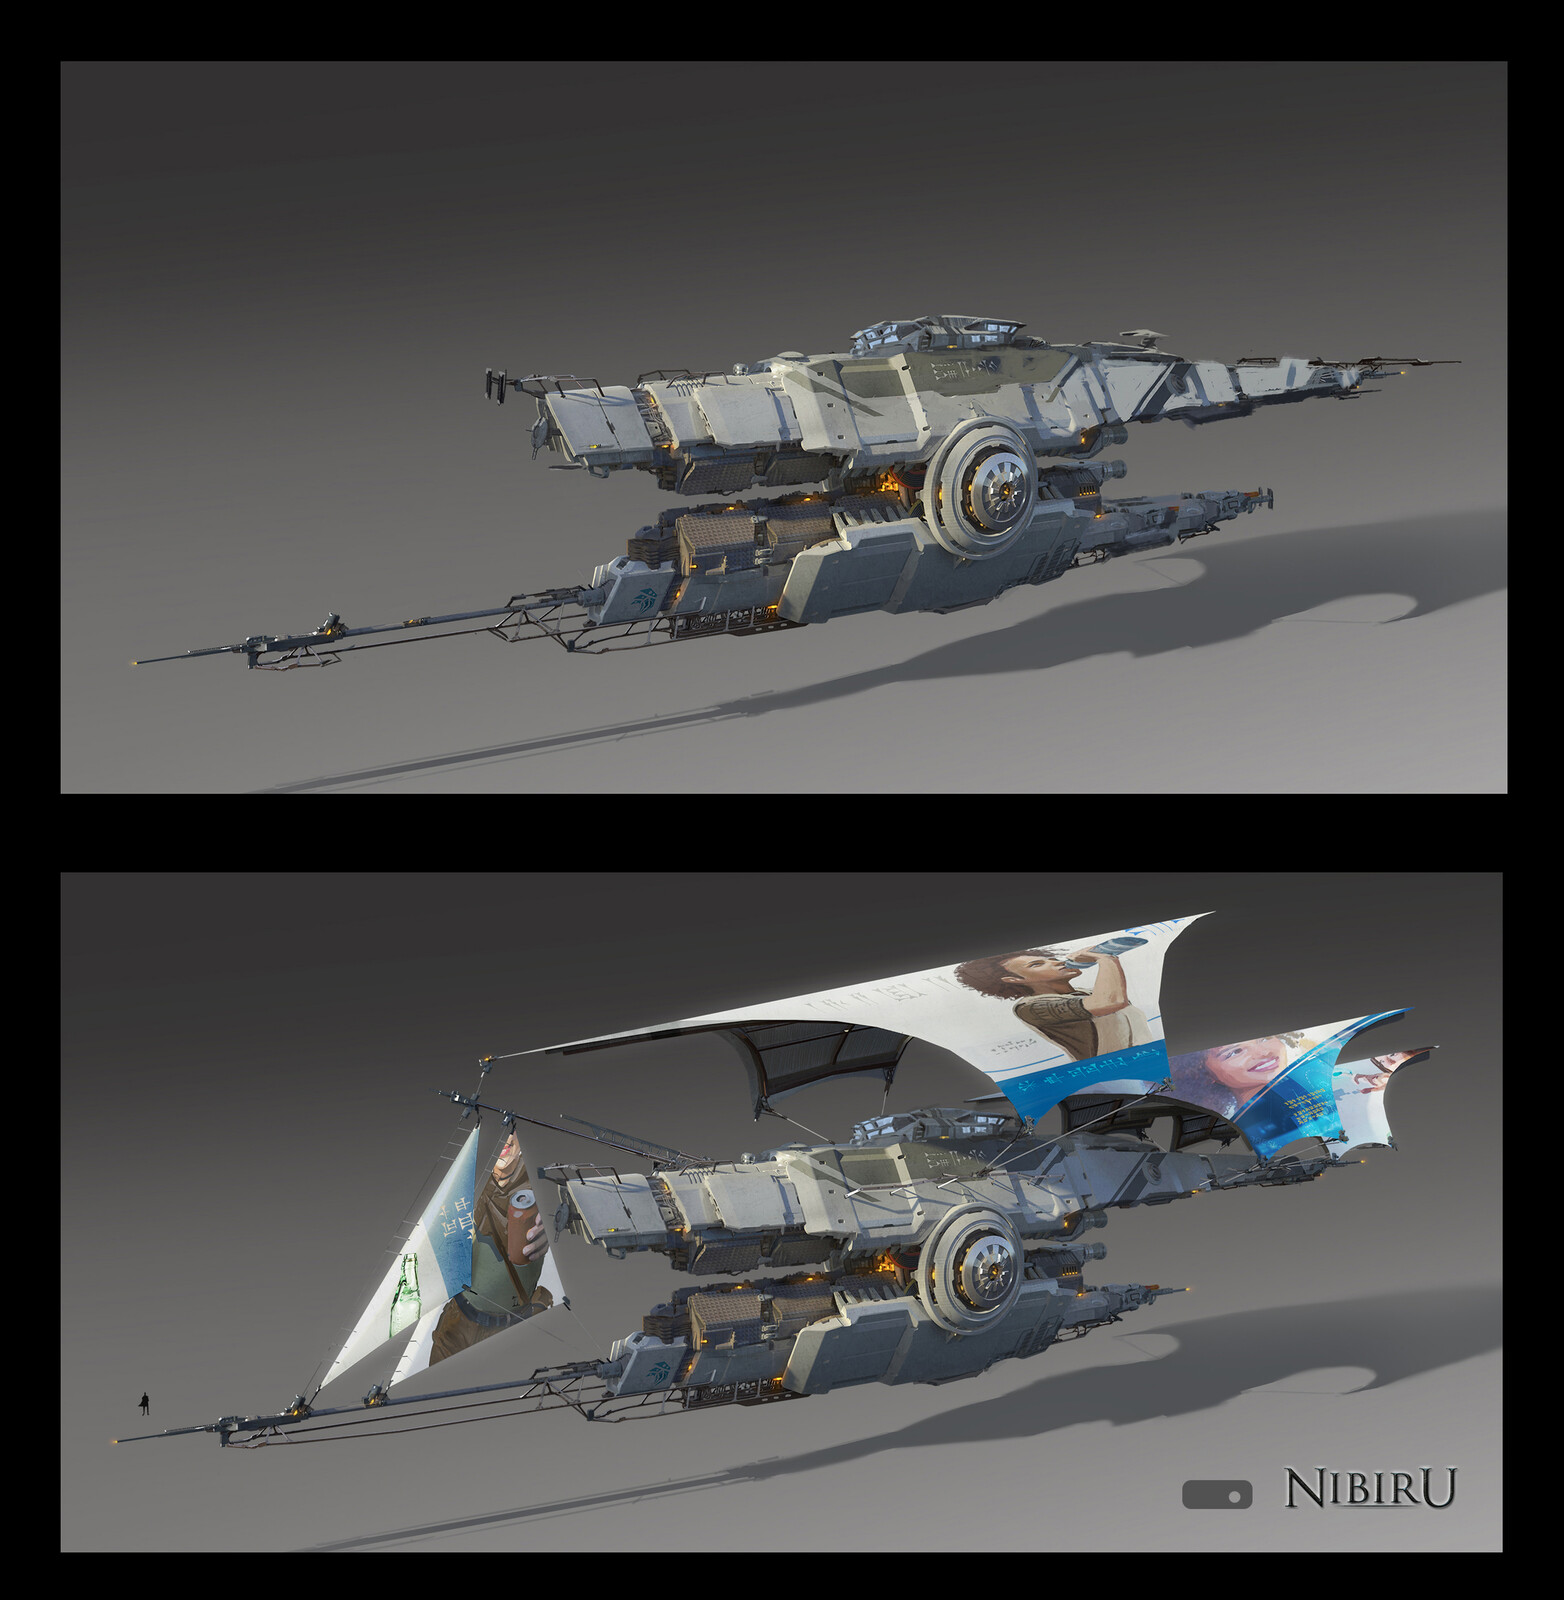 Nibiru Barge Design